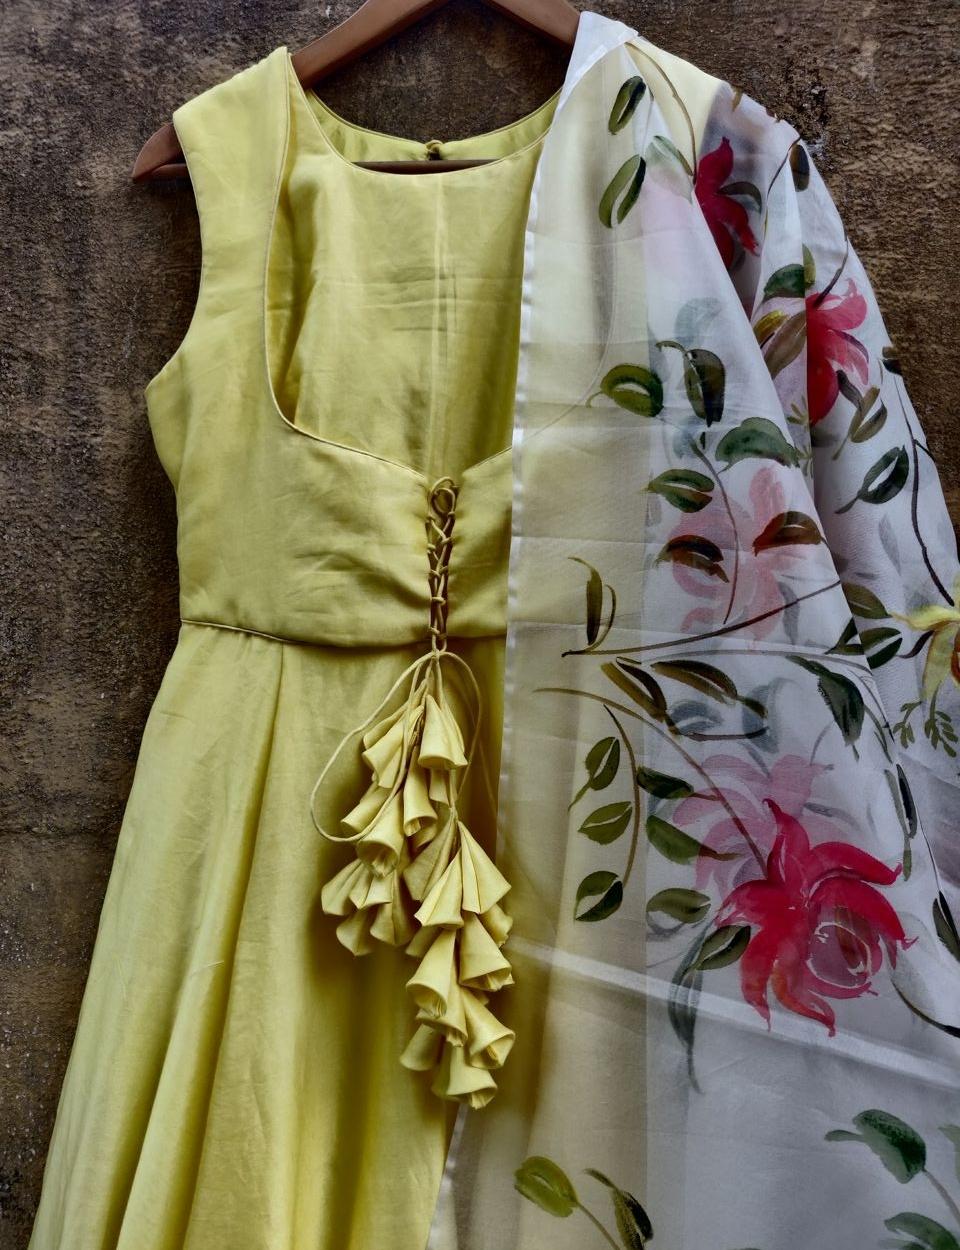 Lemon Anarkali with Hand Painted Dupatta - Fashion Brand & Designer Priti Sahni 3